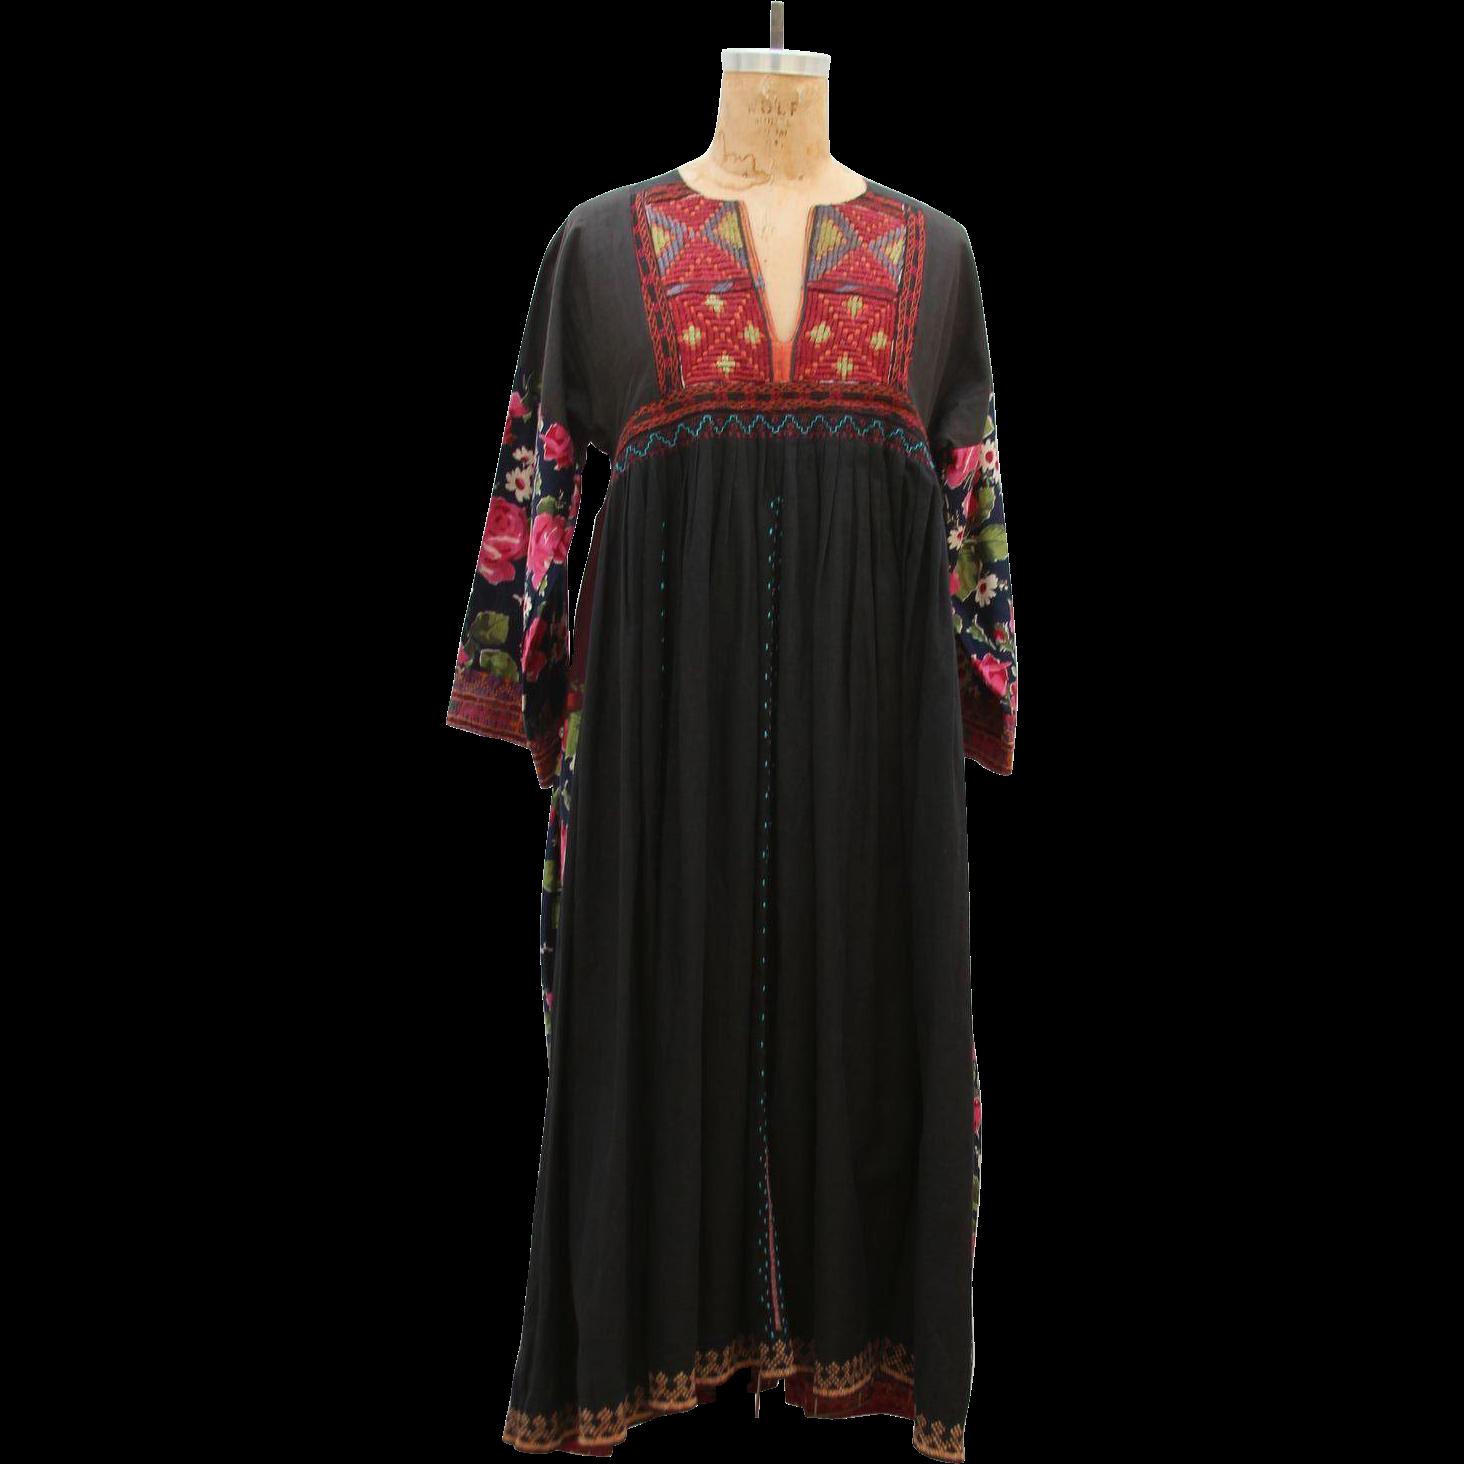 S handmade vintage embroidery flower pattern maxi dress